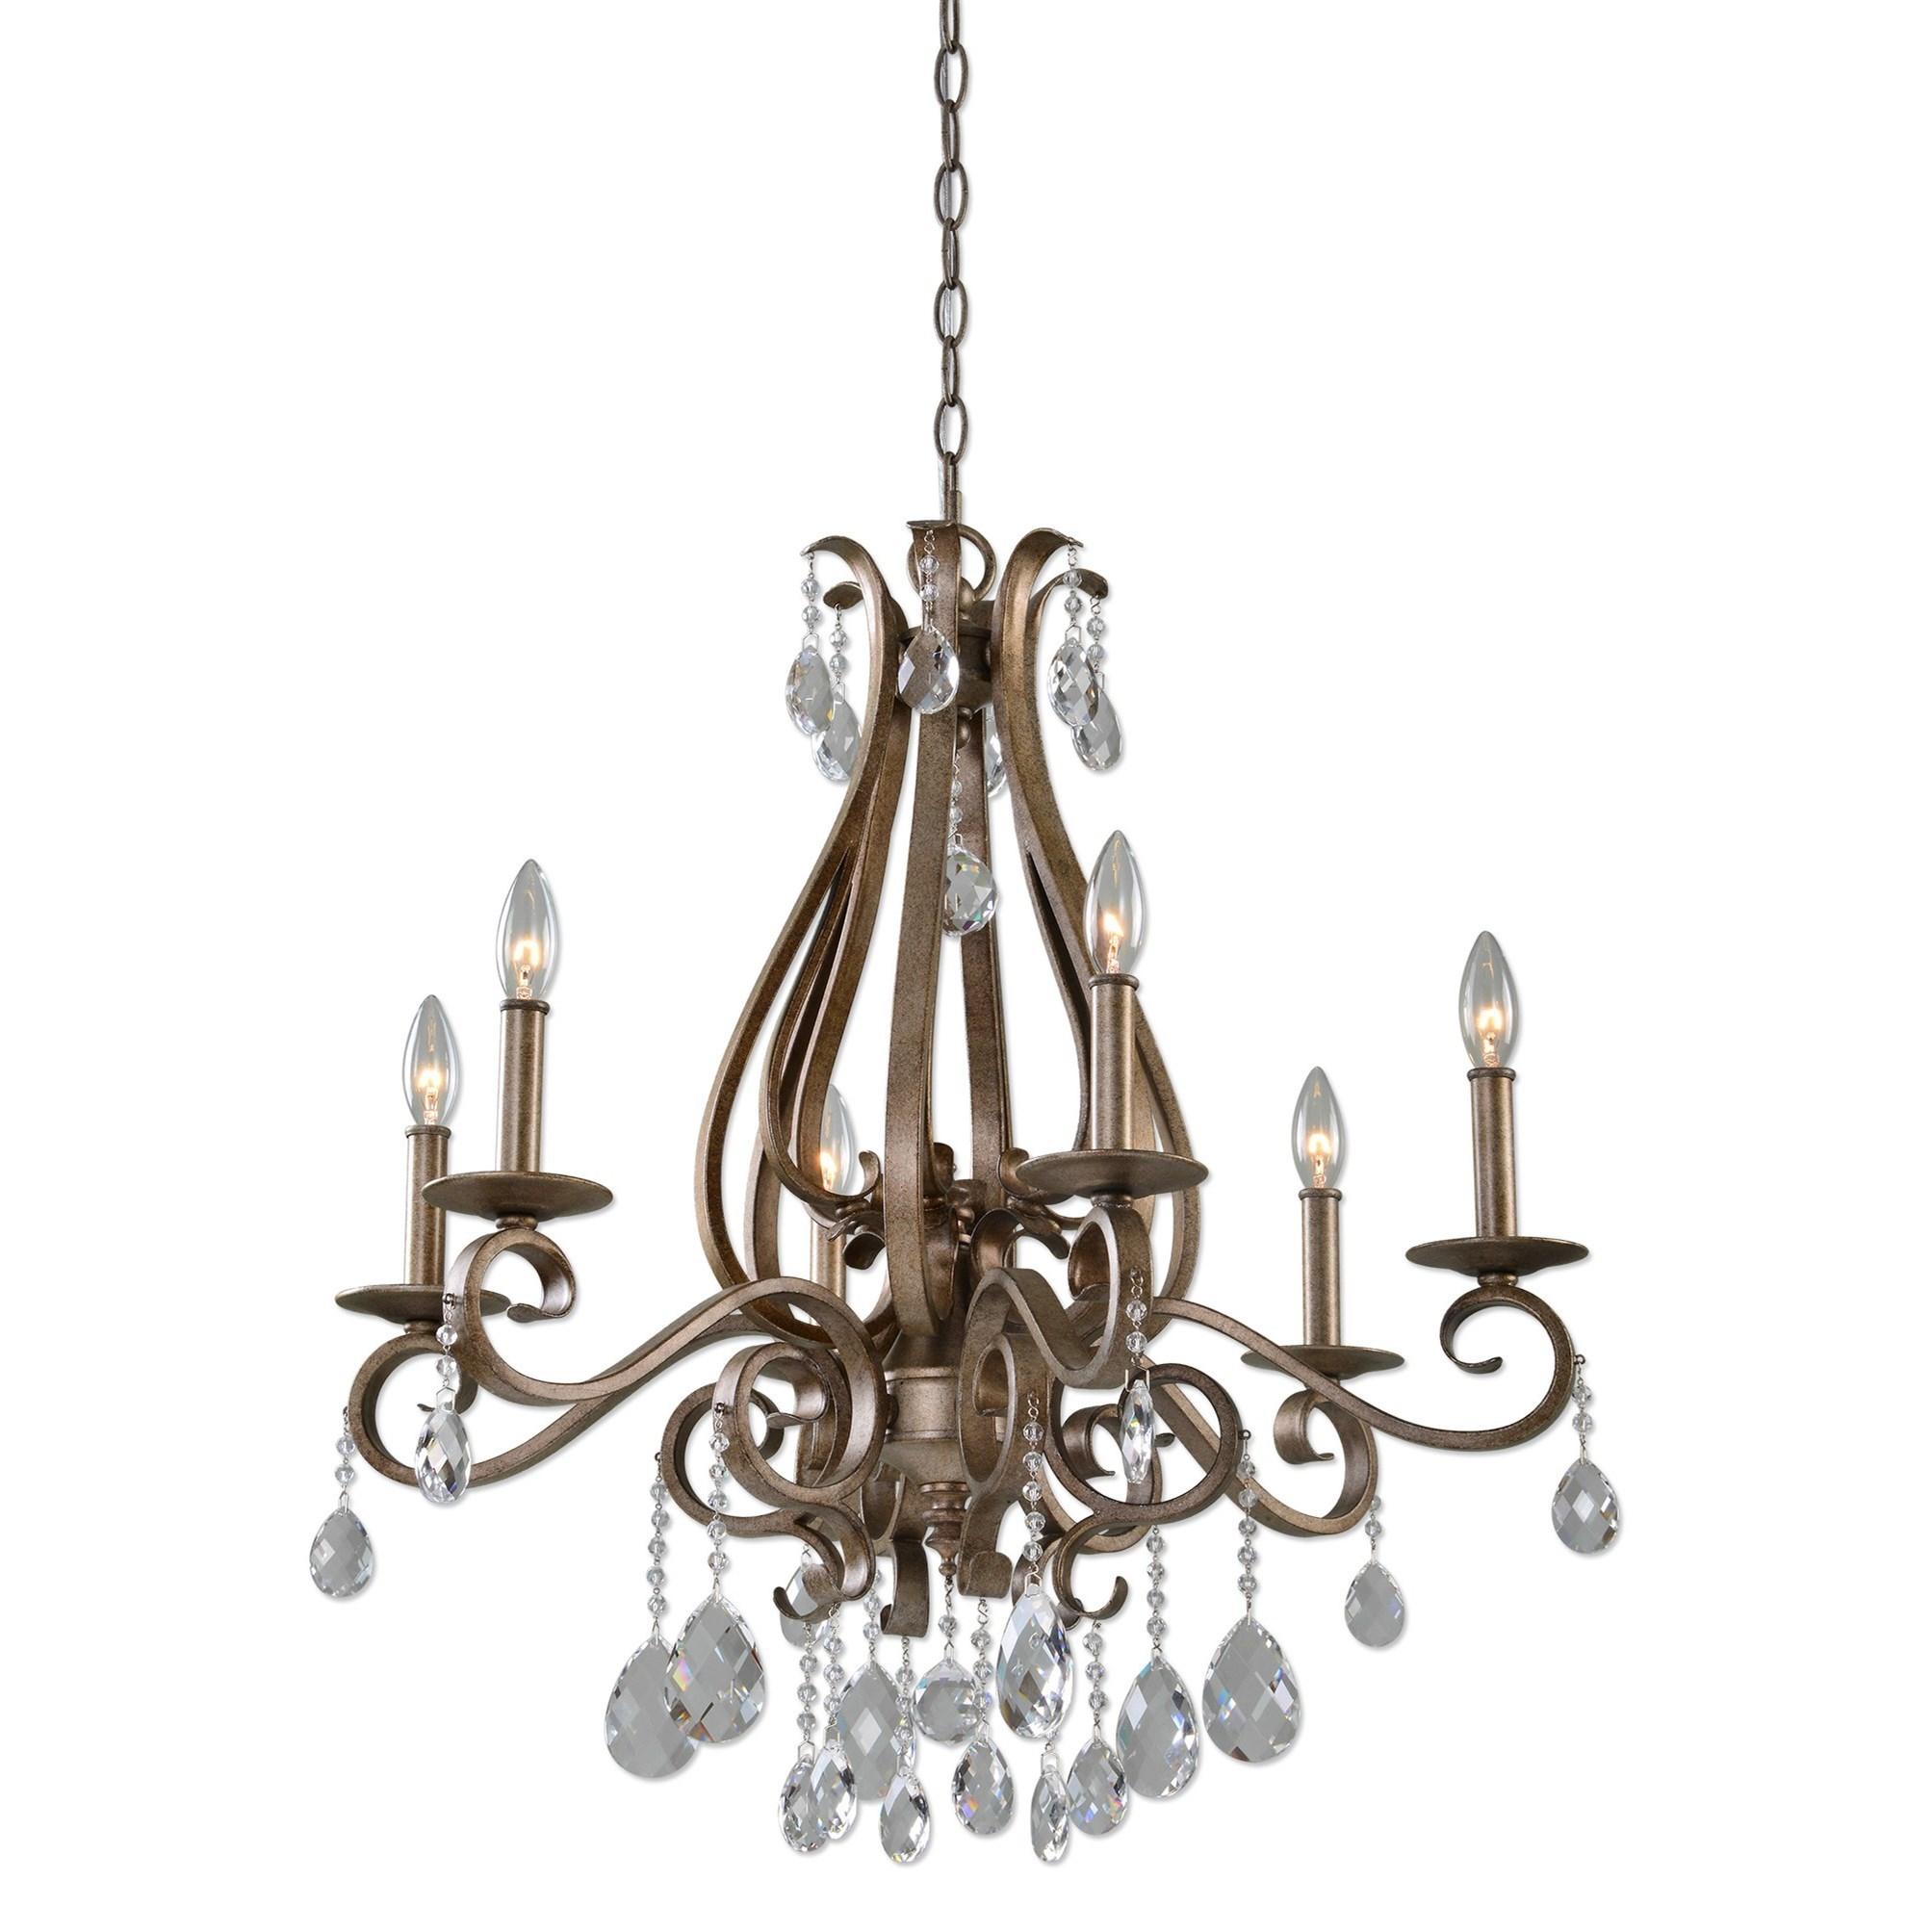 Uttermost Lighting Fixtures Siobhan 6 Light Crystal Chandelier - Item Number: 21289